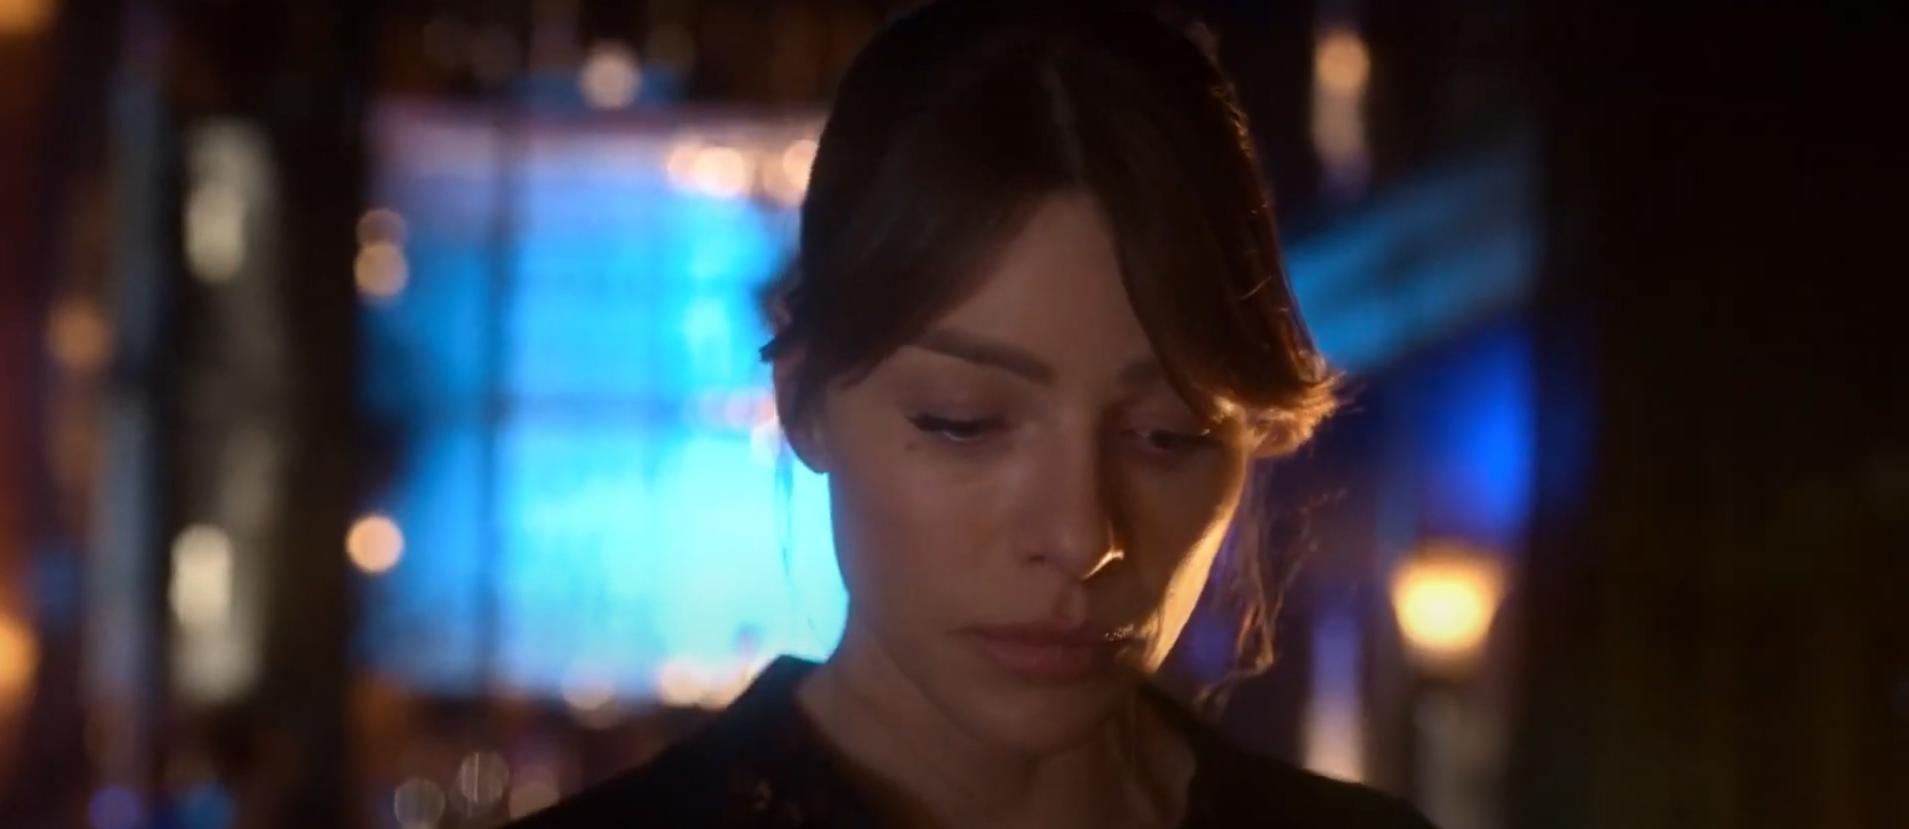 Скриншот из сериала Люцифер 5 сезон Хлоя